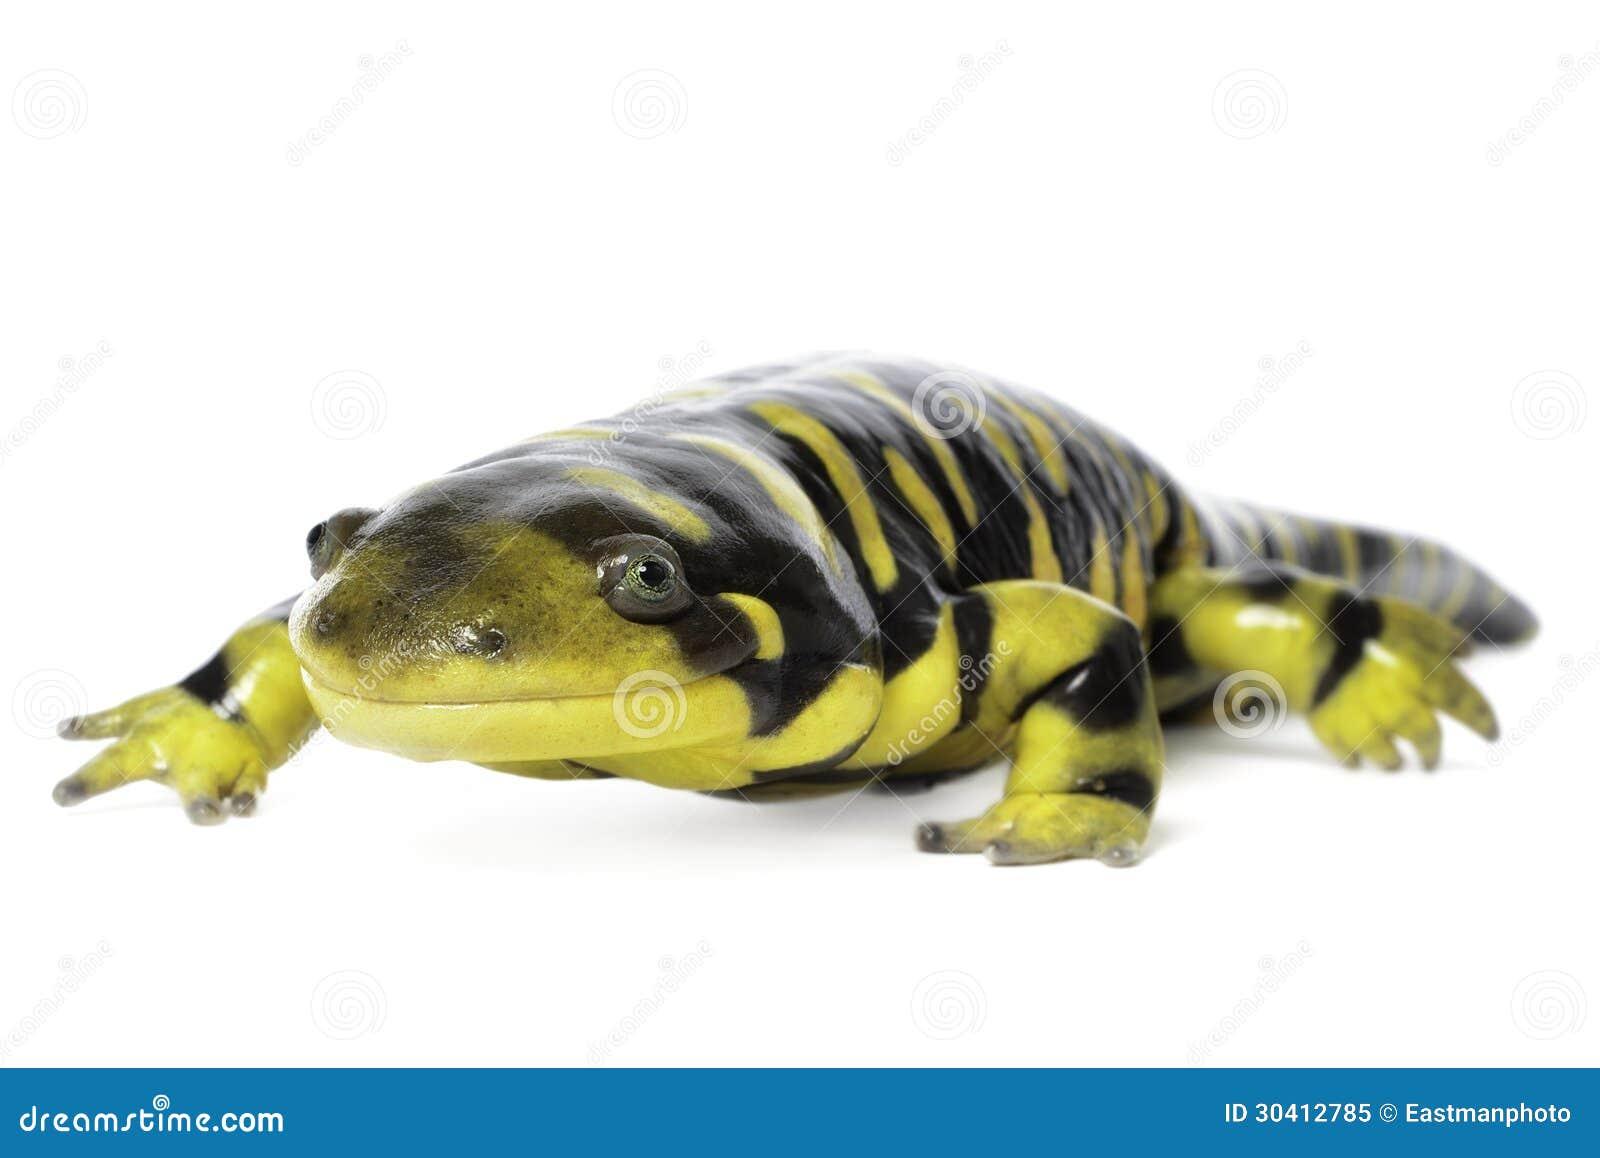 salamander white background - photo #39